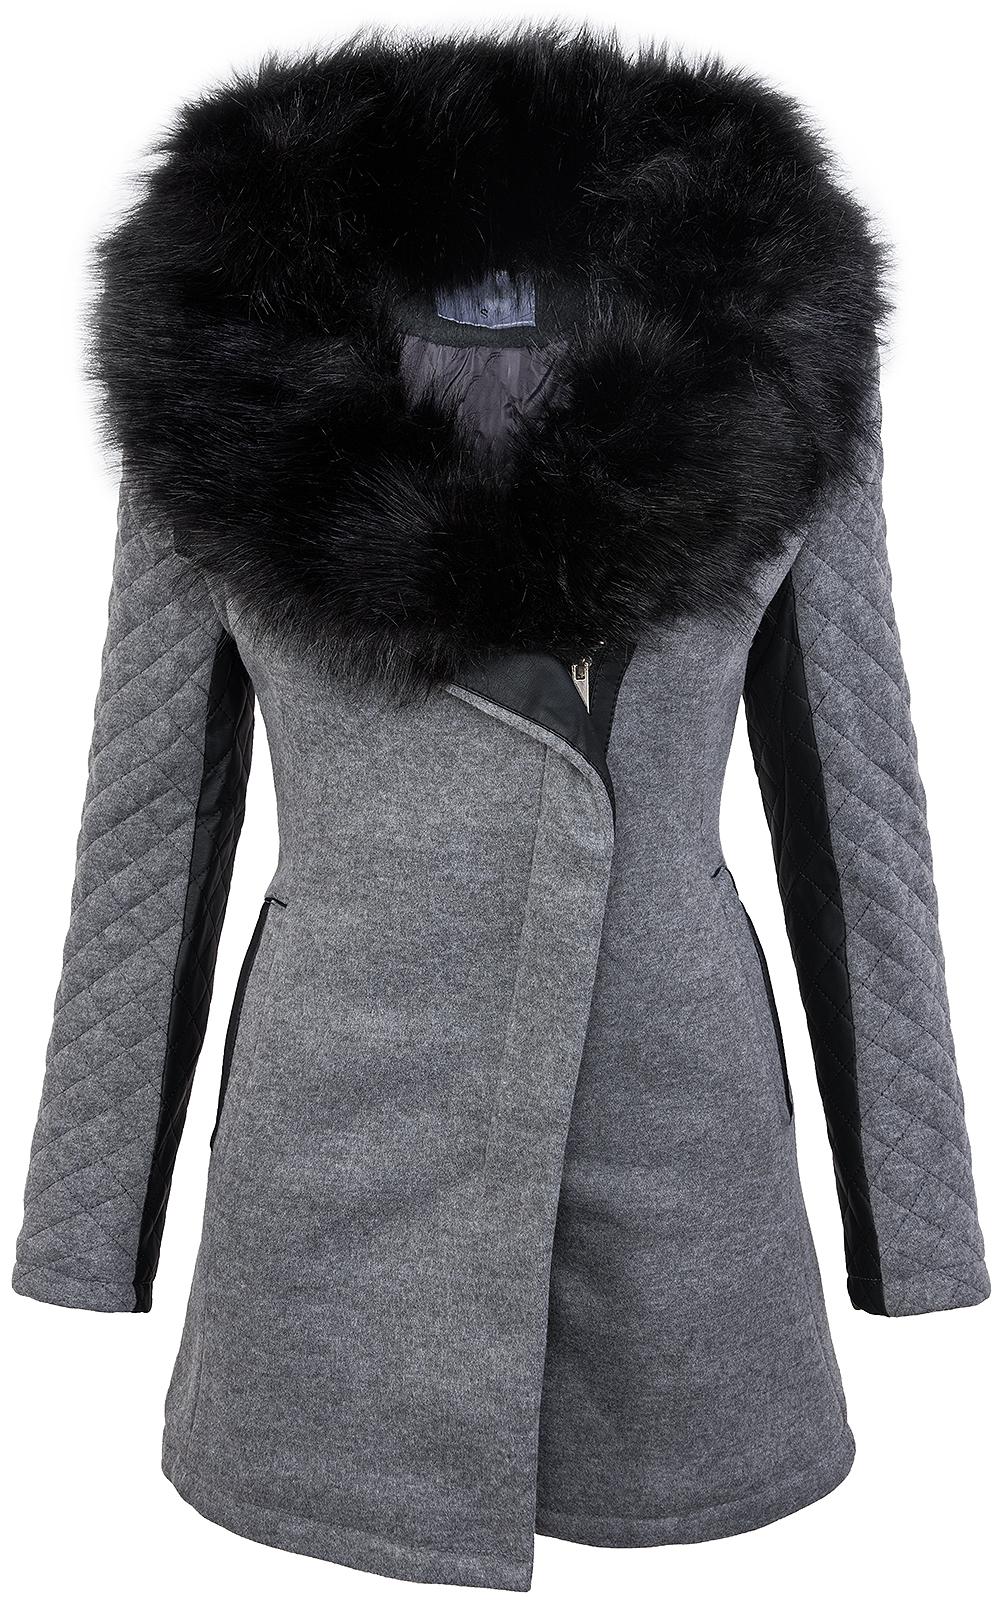 cb93ed5343f306 Damen designer winter jacke schwarzer fellkragen jacke mantel ...